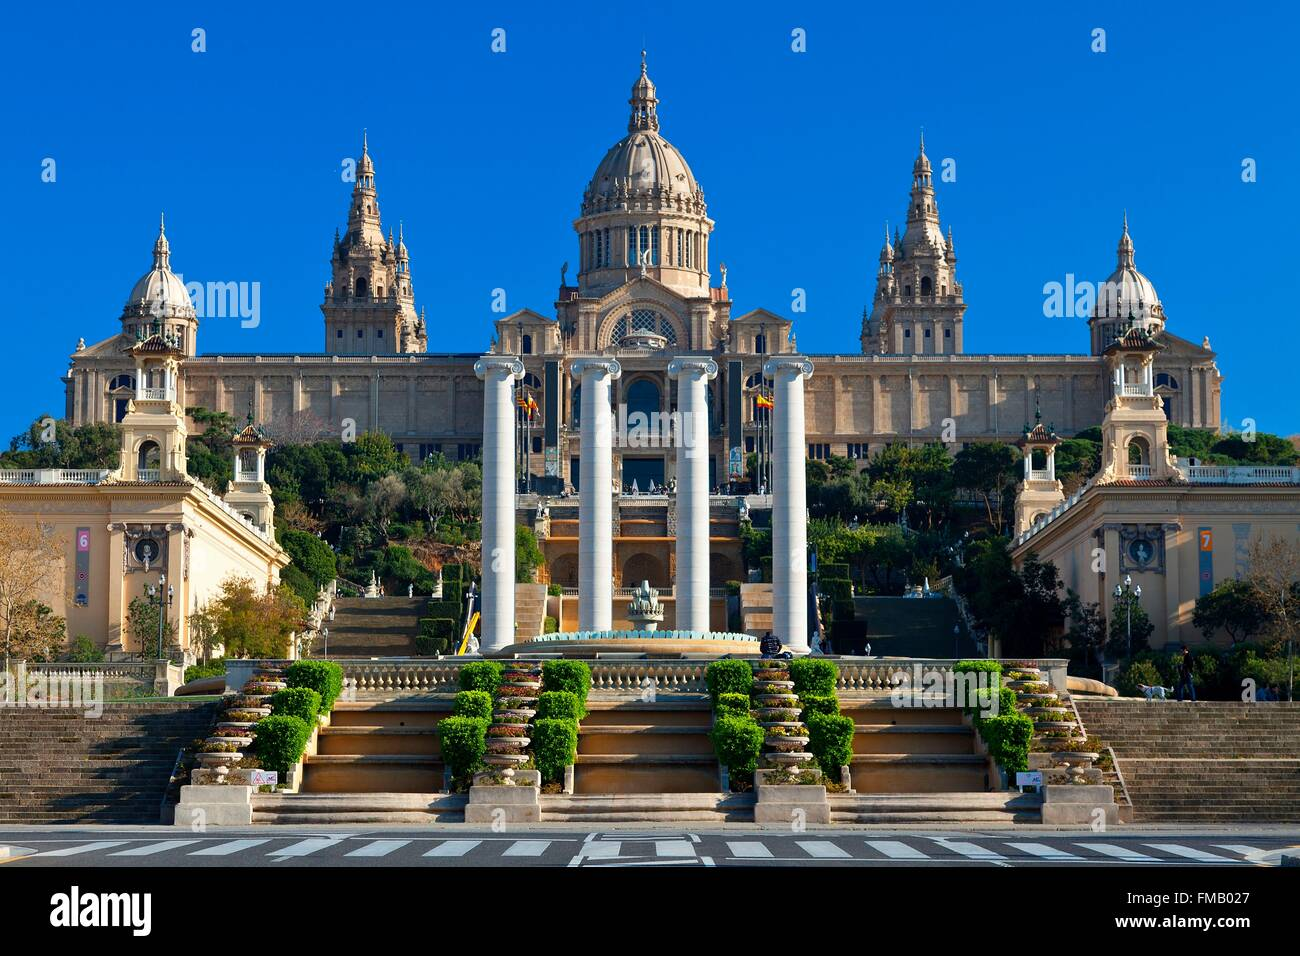 Spain, Catalonia, Barcelona, Montjuic, National Palace (Palau Nacional), Catalonia National Museum of Art (MNAC) - Stock Image